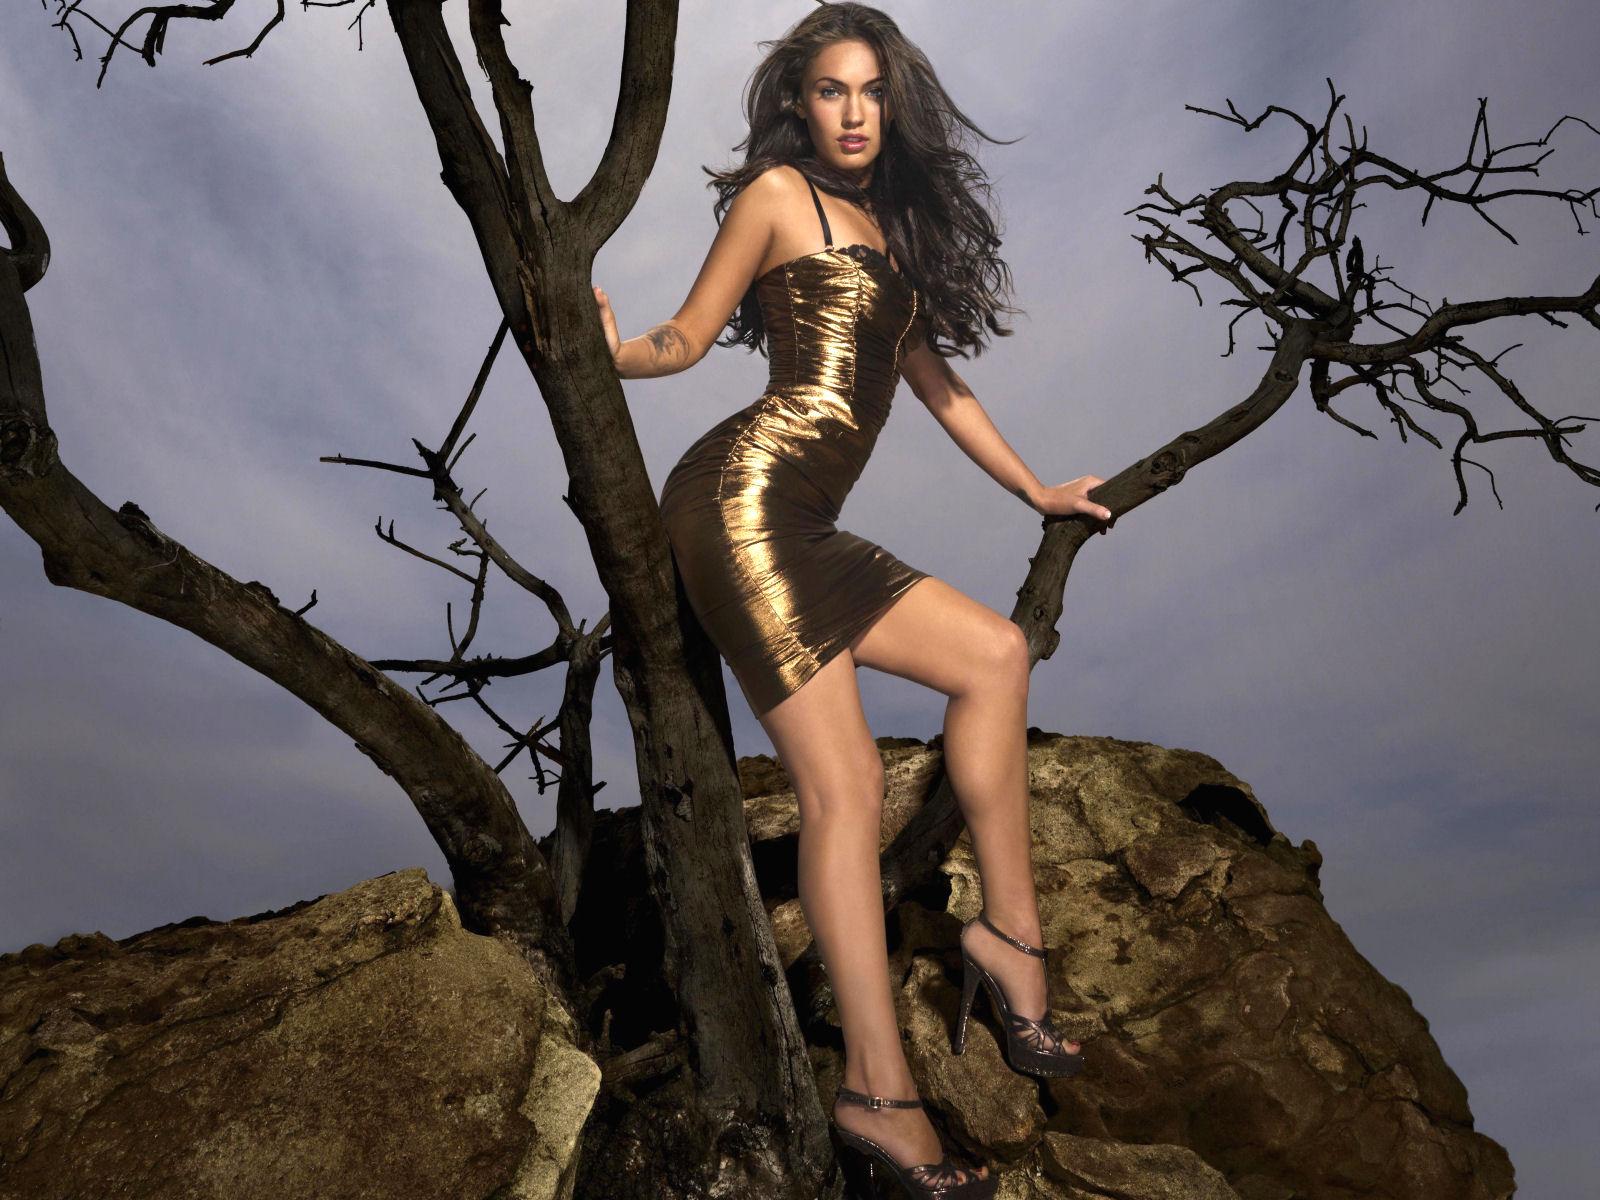 Attractive Wallpapers Of Megan Fox Nude Pic